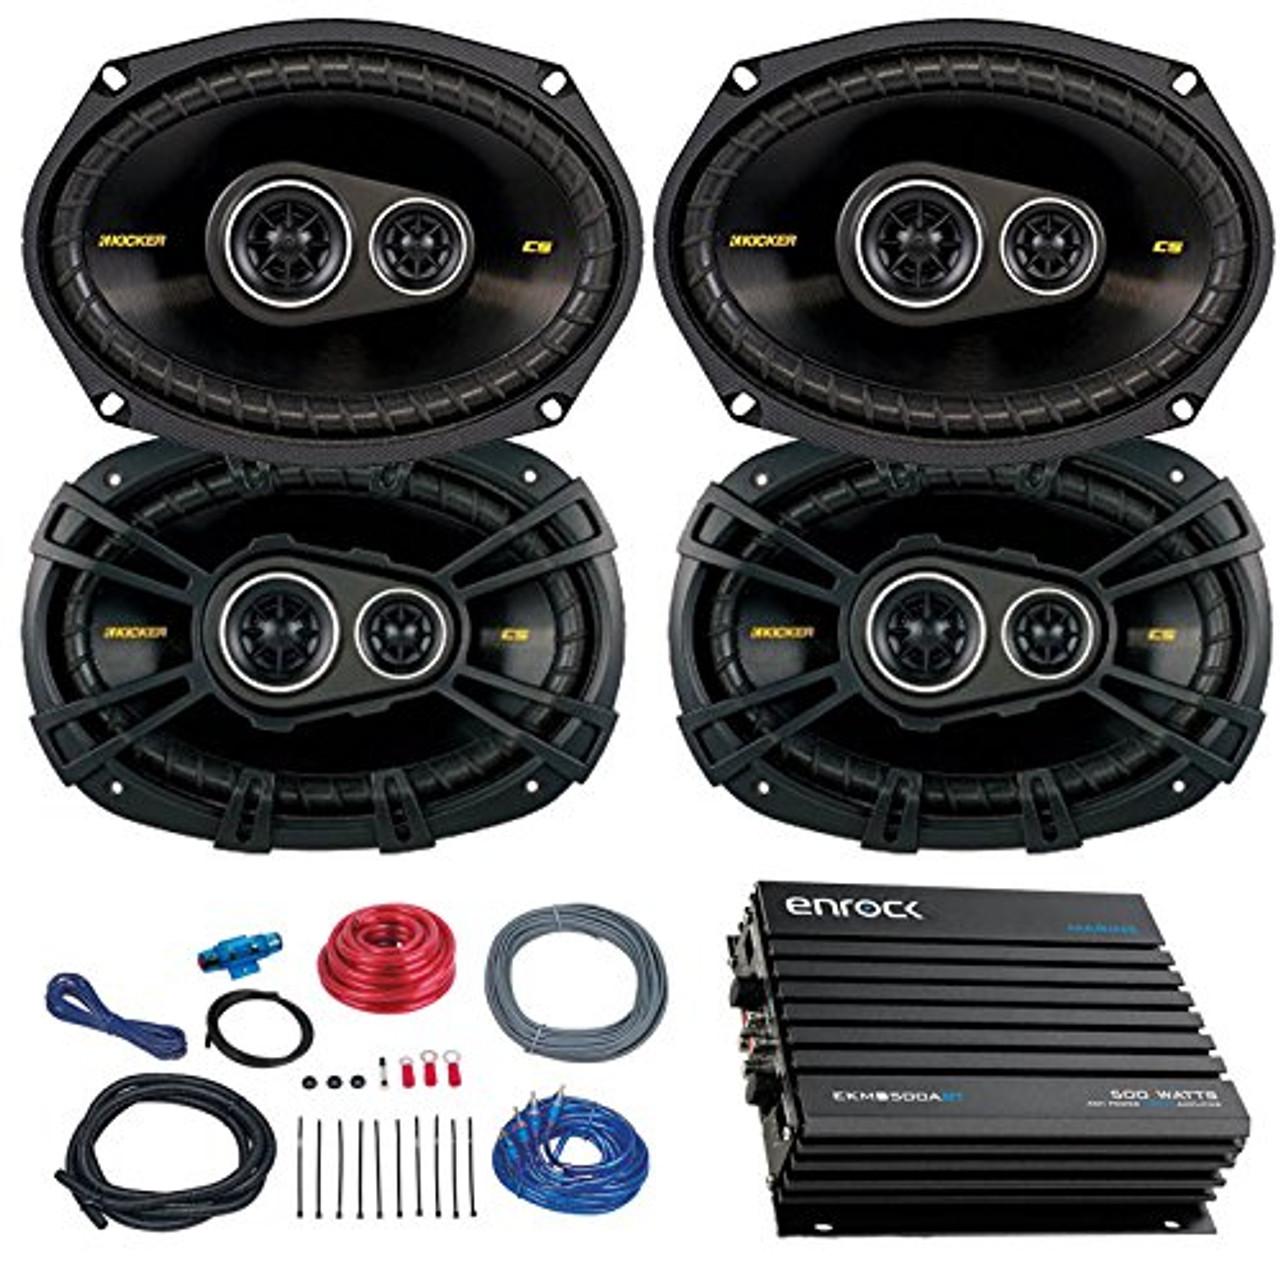 medium resolution of car speaker set with amplifier 4 kicker cs6934 6x9 inch 900 watt 4 ohm